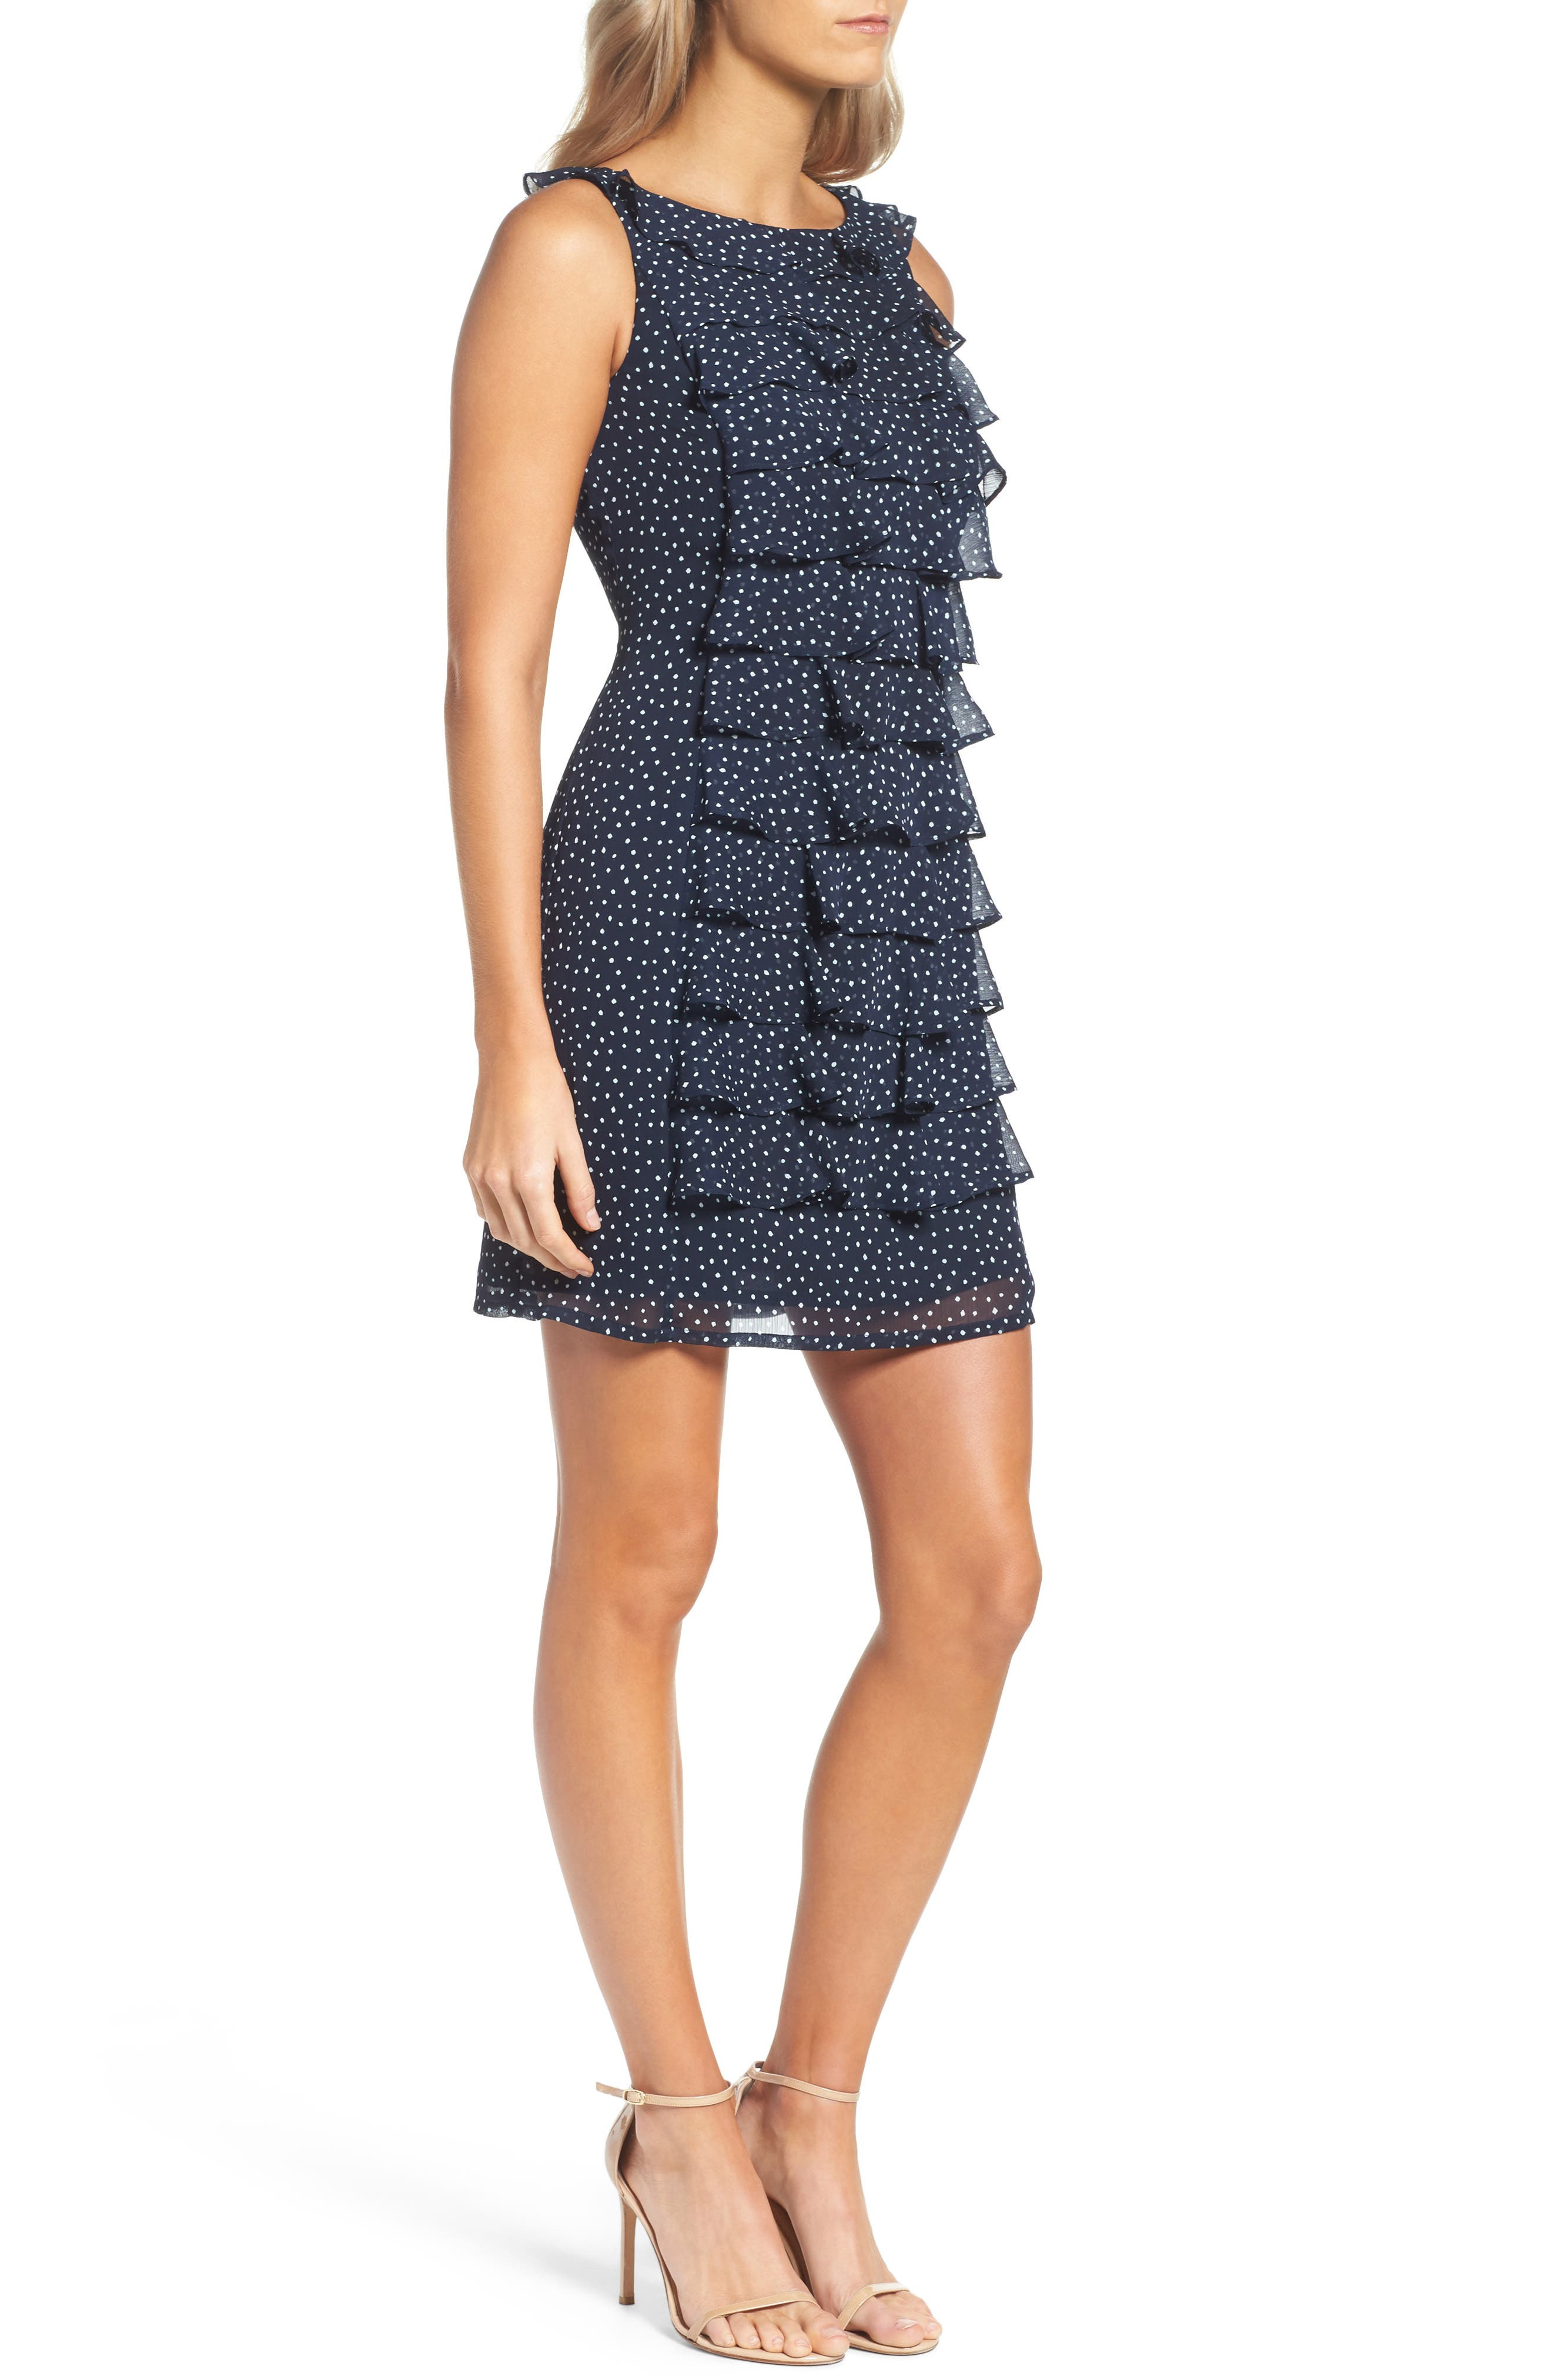 Alternate Image 3  - Adrianna Papell Polka Dot Ruffle Dress